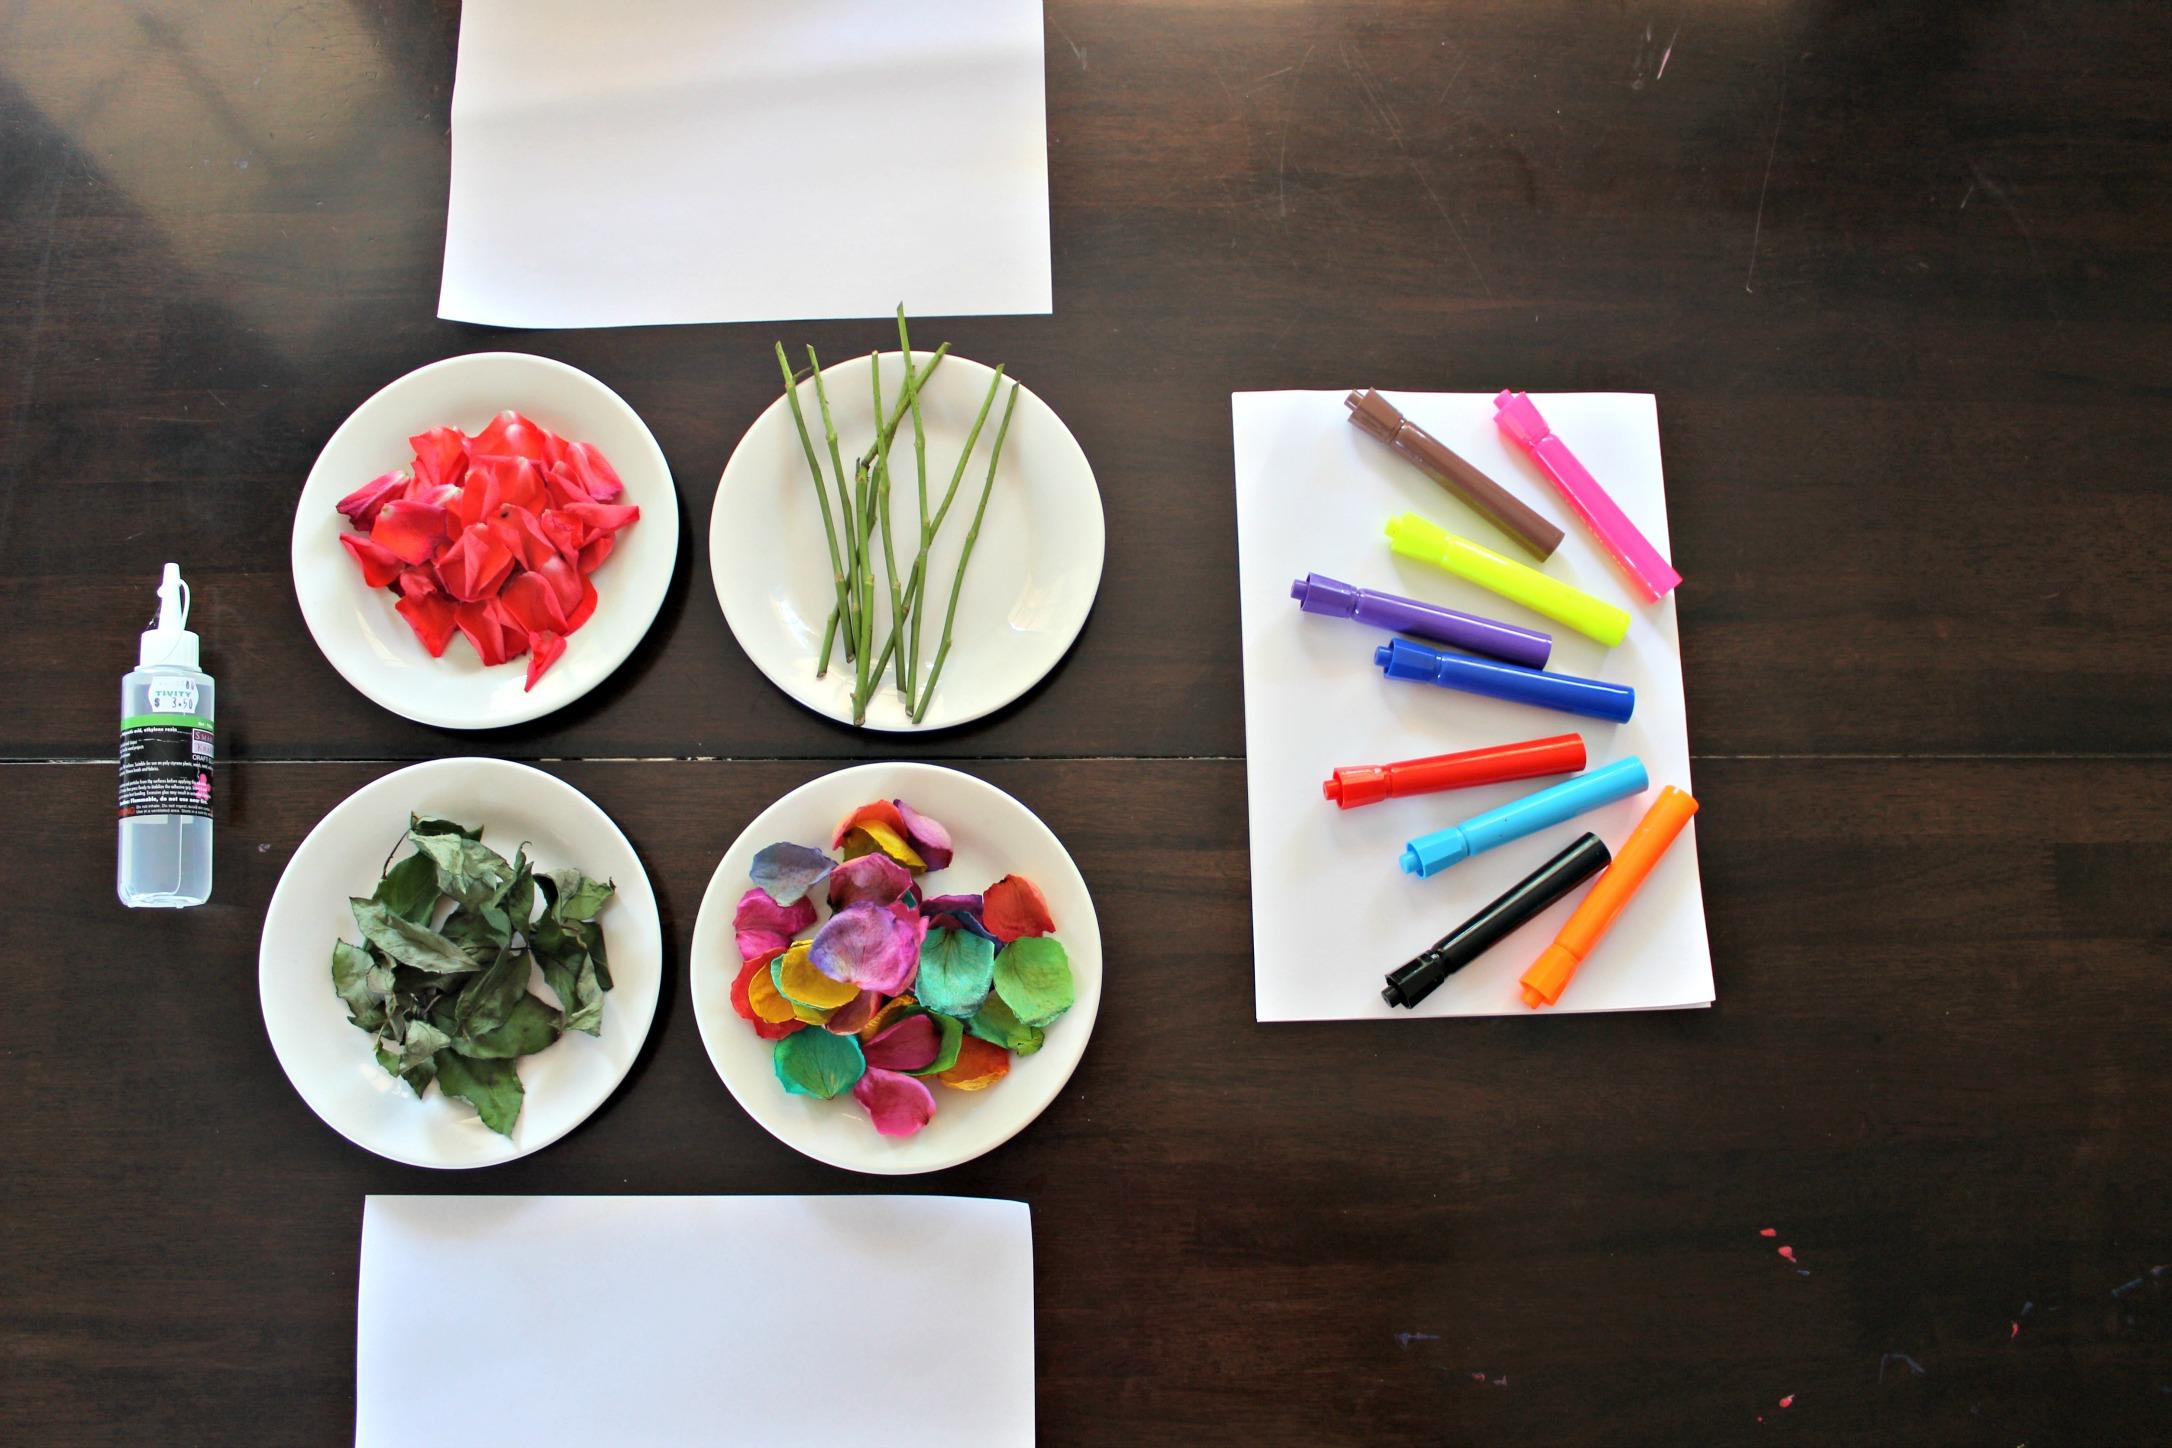 flower-craft-ideas-for-kids